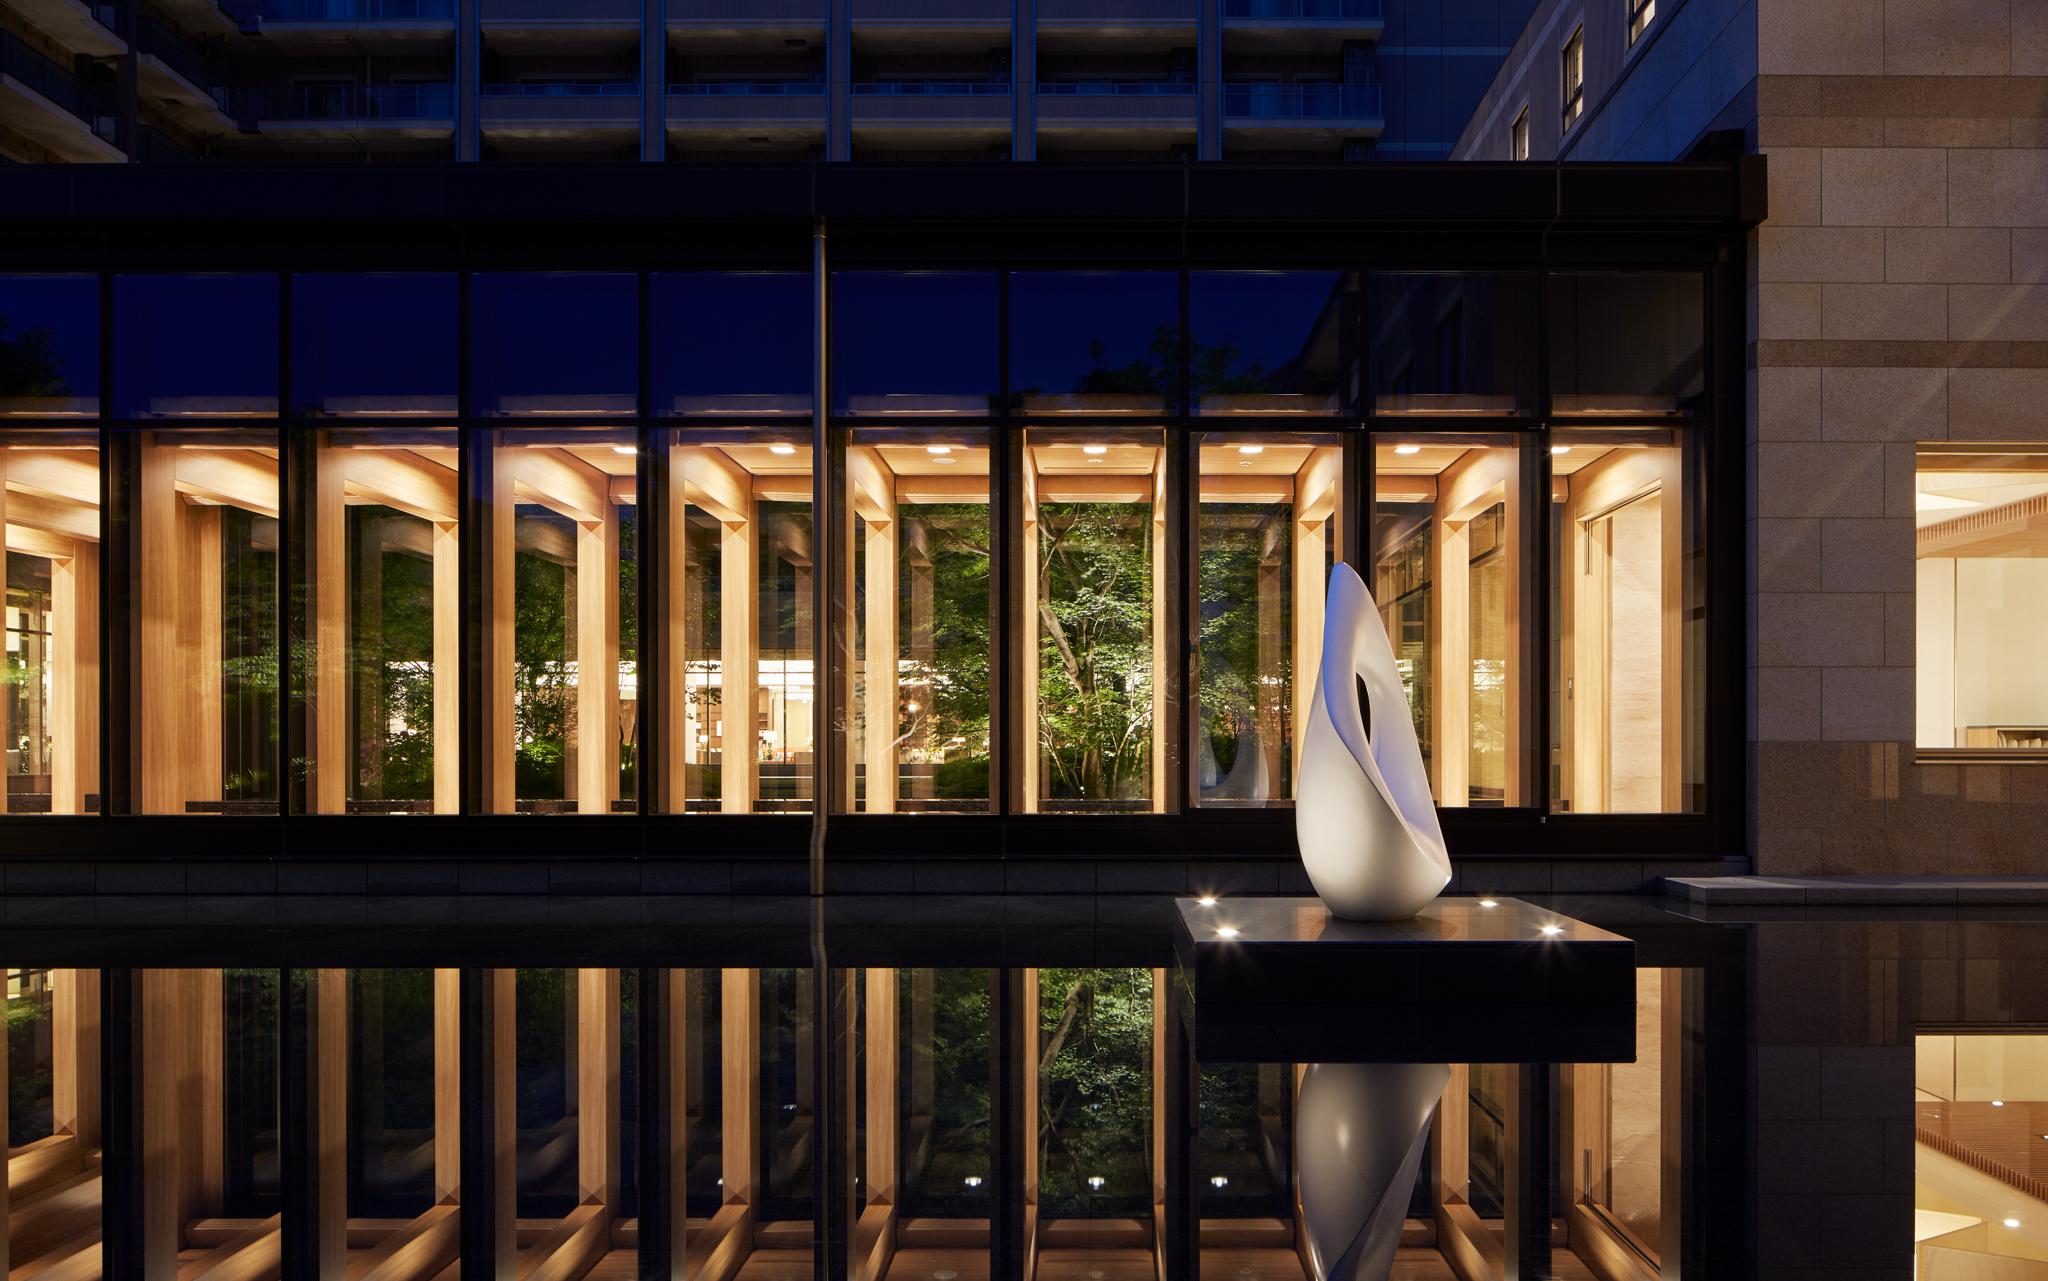 Sun City Exterior  Richard Beard Architects  Tachikawa, Japan     Return to Projects